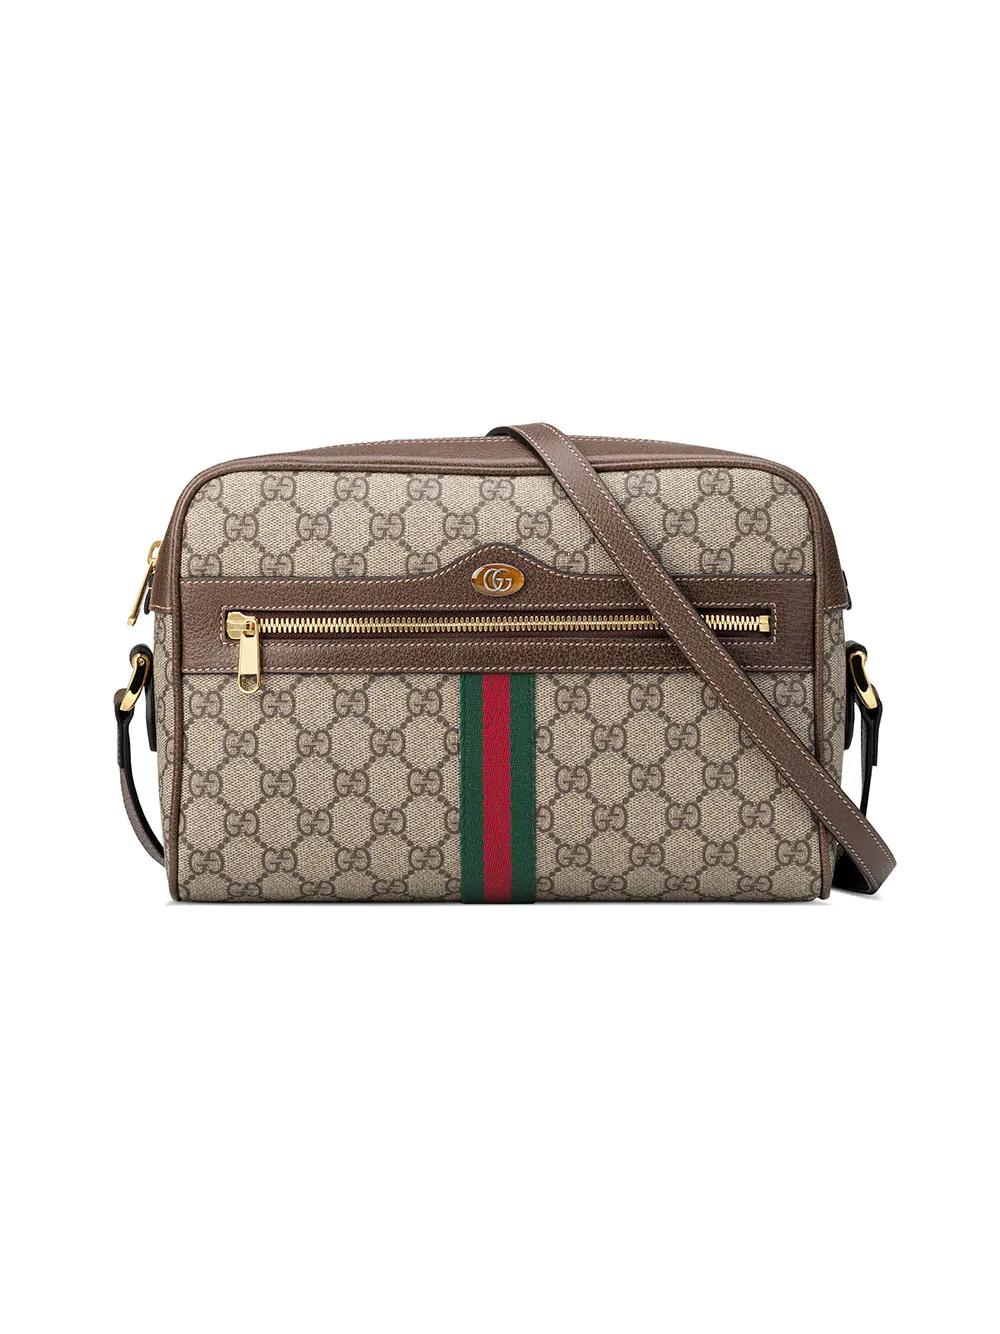 aa70b5357c8f Gucci Ophidia Gg Supreme Canvas Crossbody Bag - Beige In 8745 Beige ...